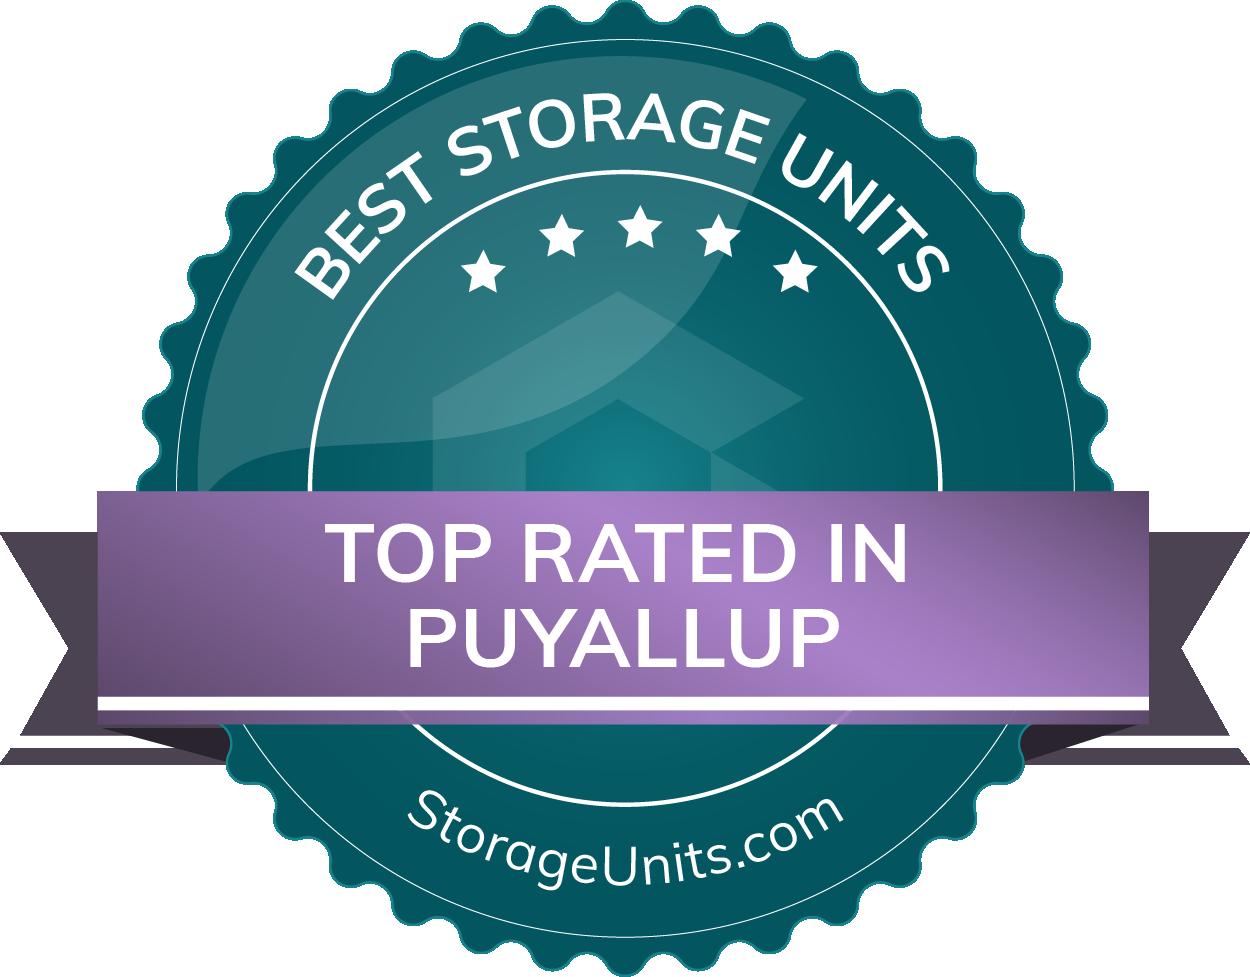 Best Self Storage Units in Puyallup, WA